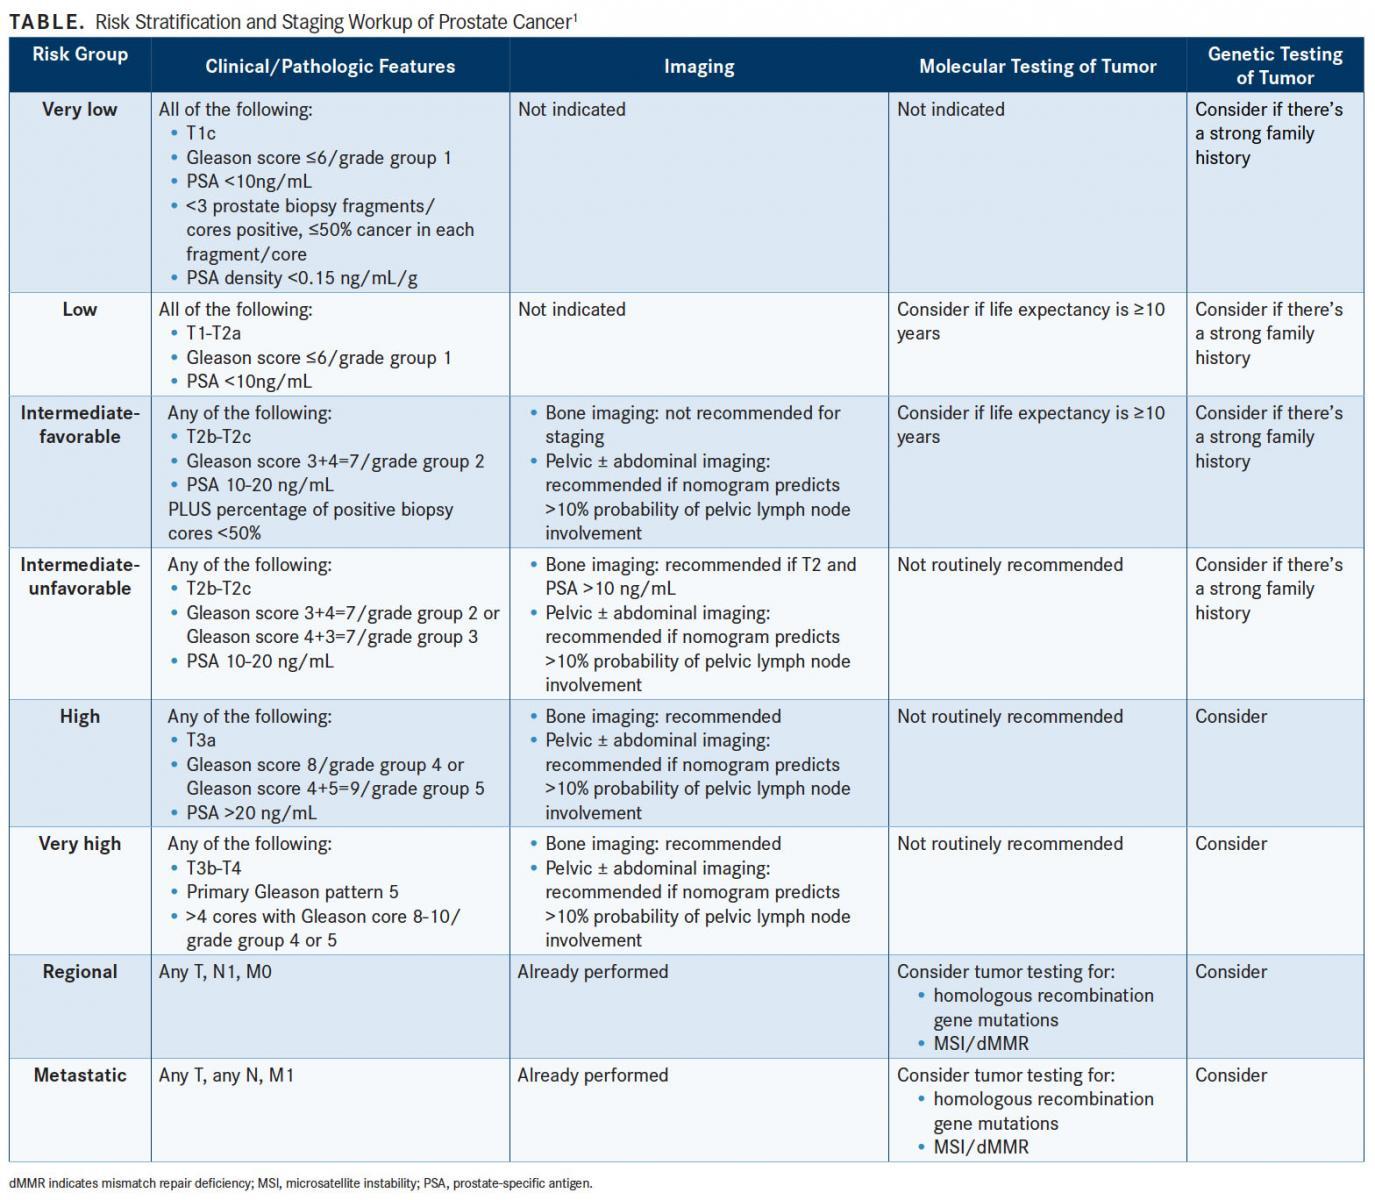 linee guida nccn prostata 2020 vs